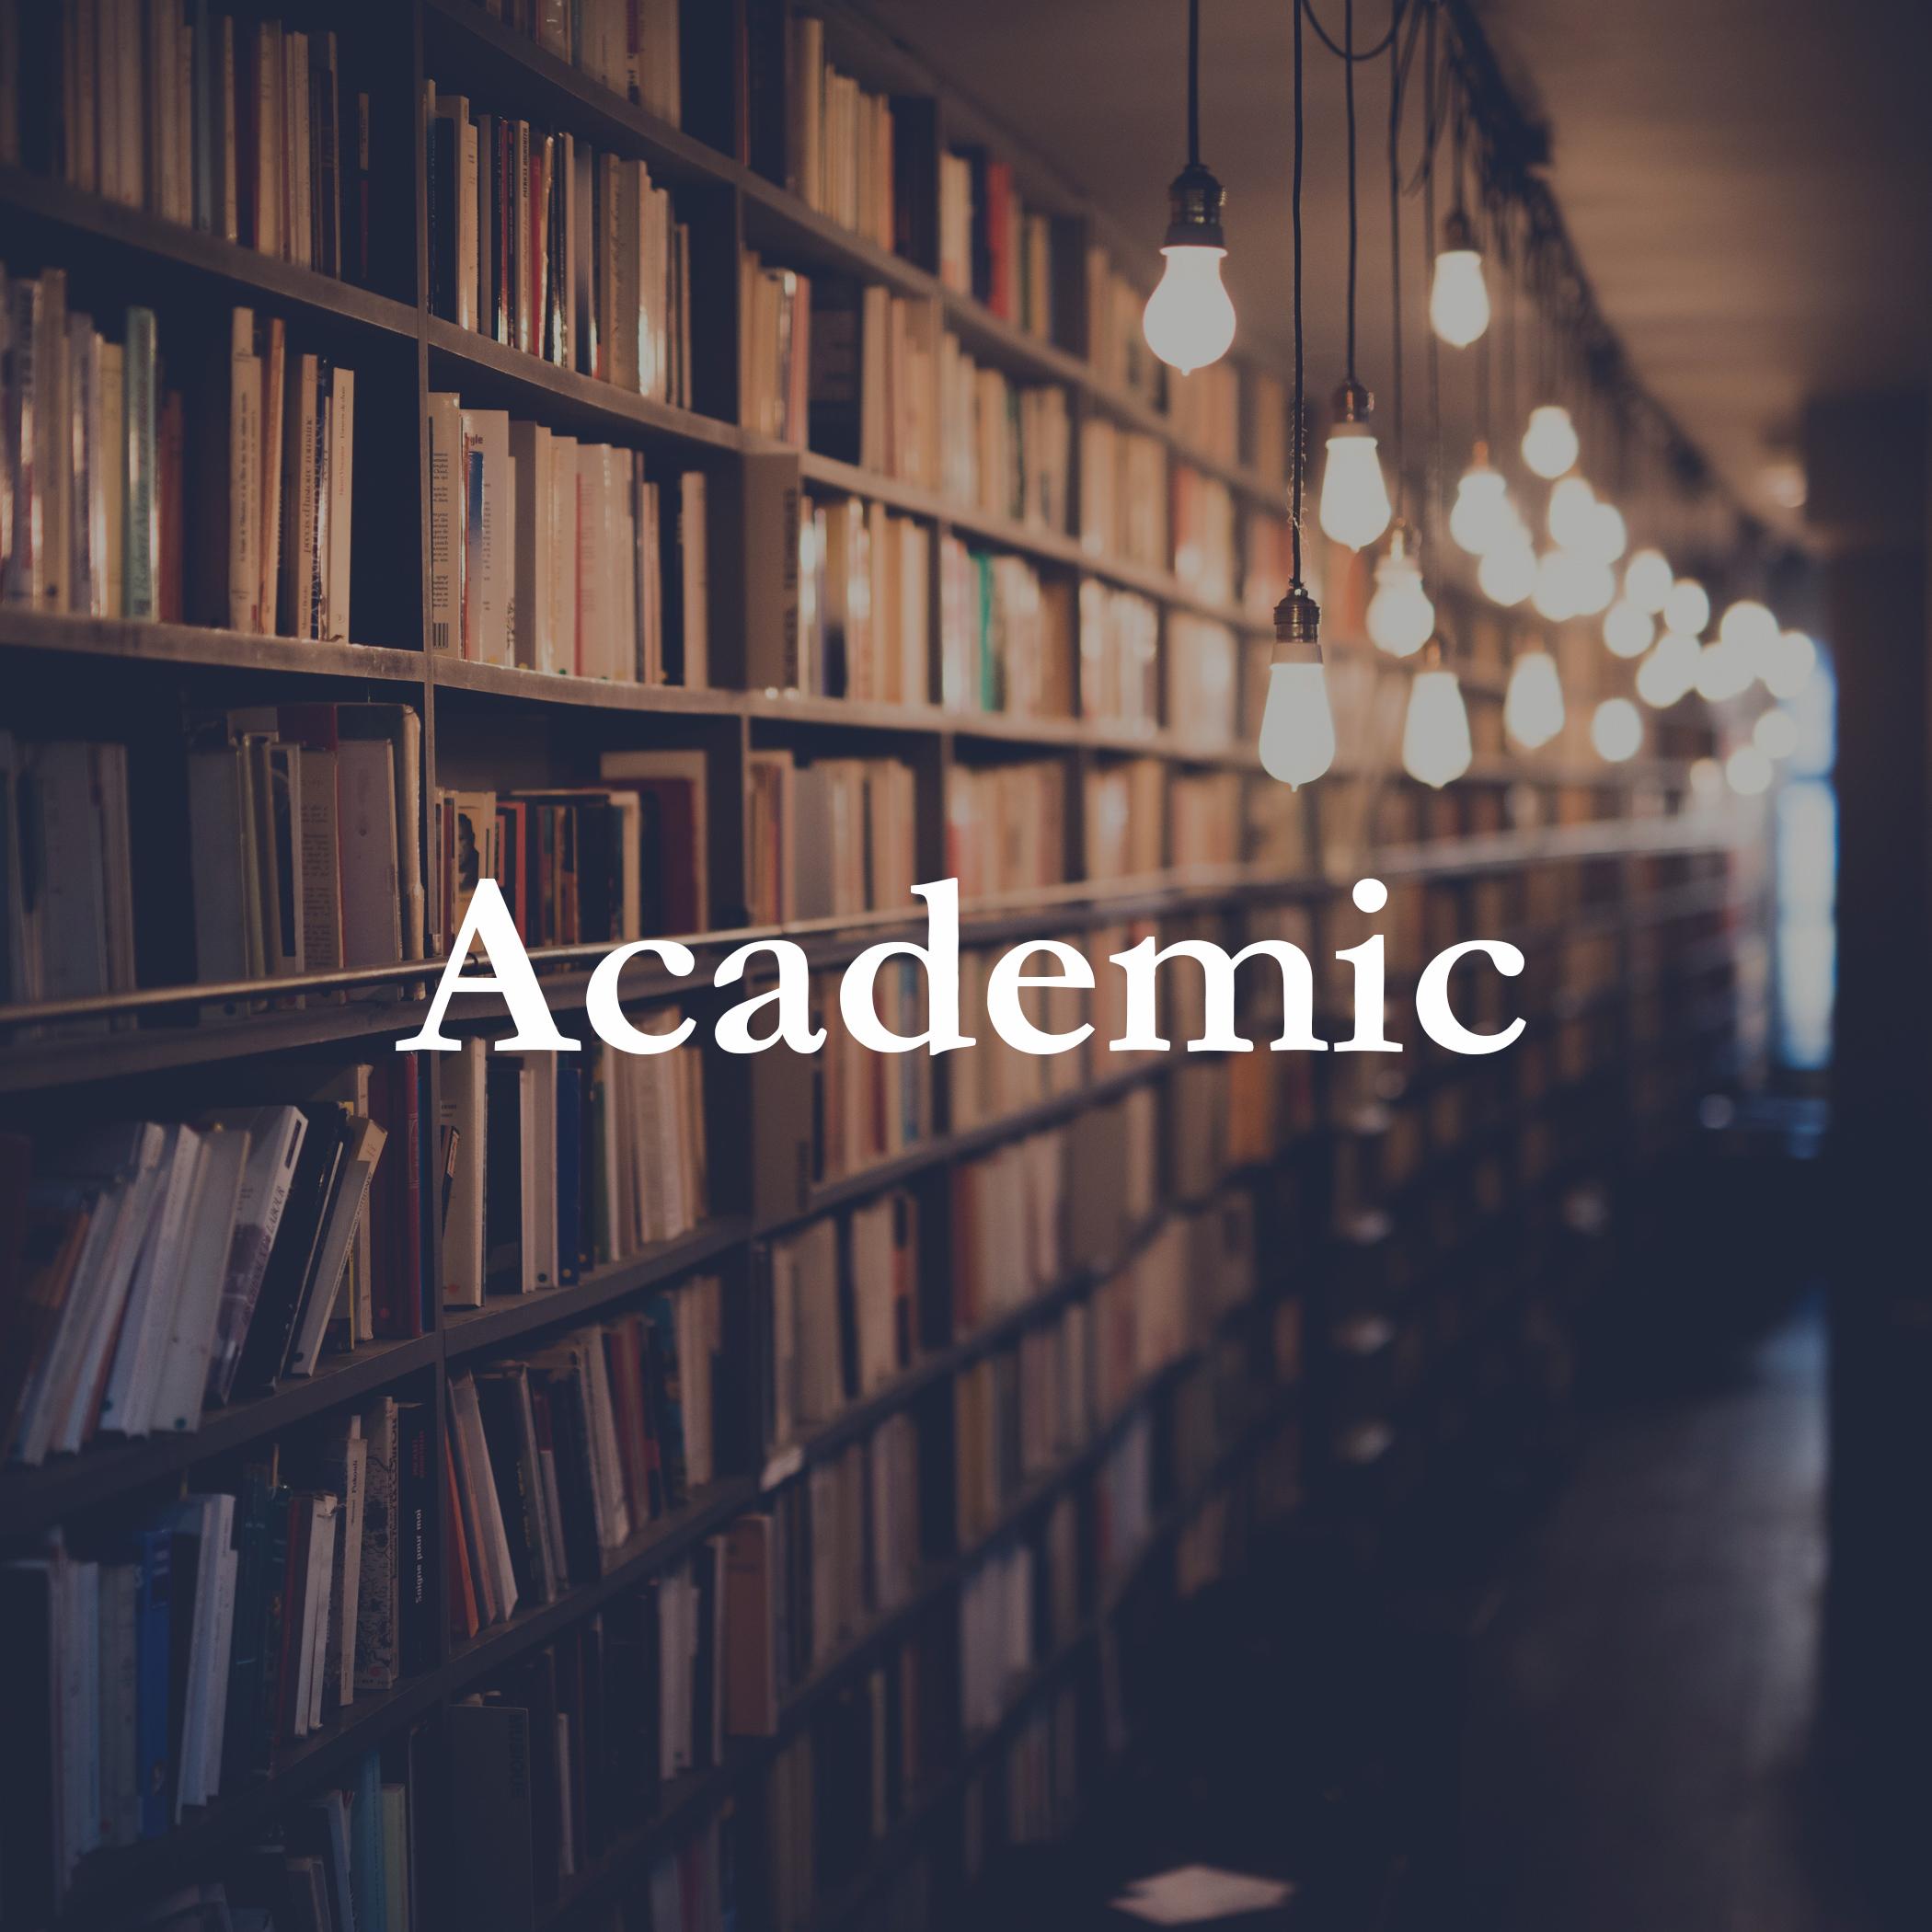 Written Academic.jpg